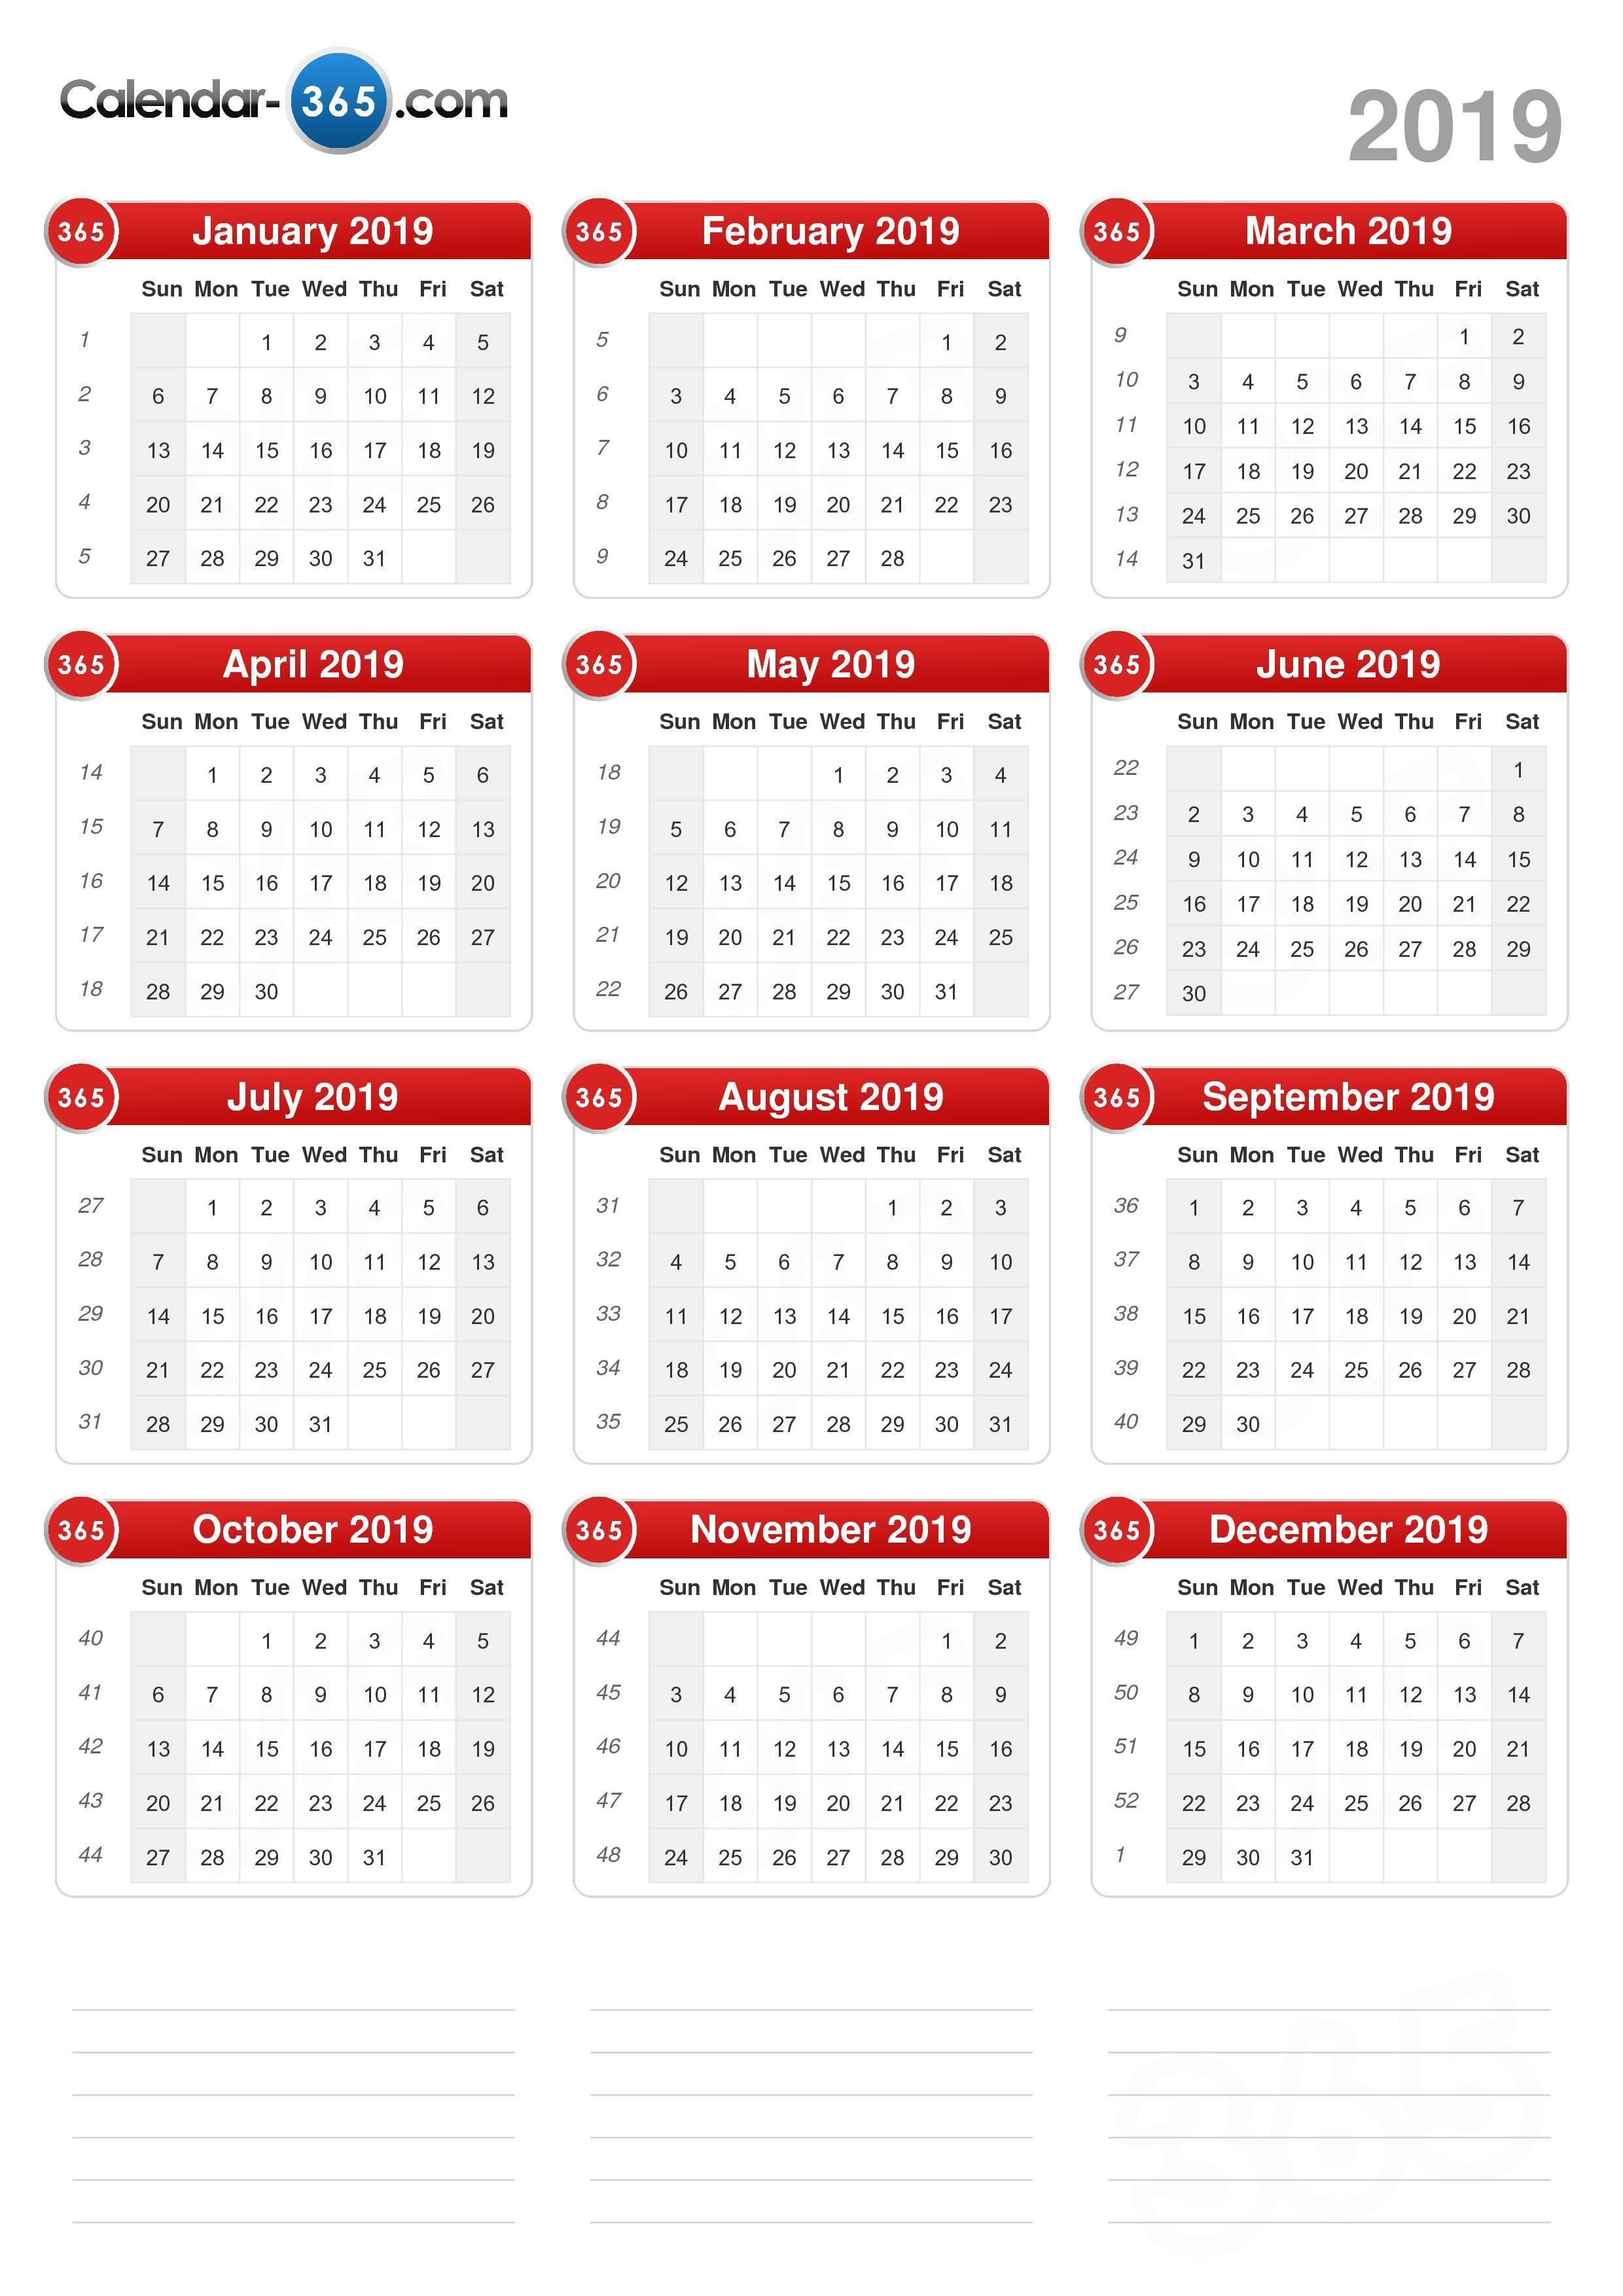 2019 Calendar Calendar 2019 Time And Date